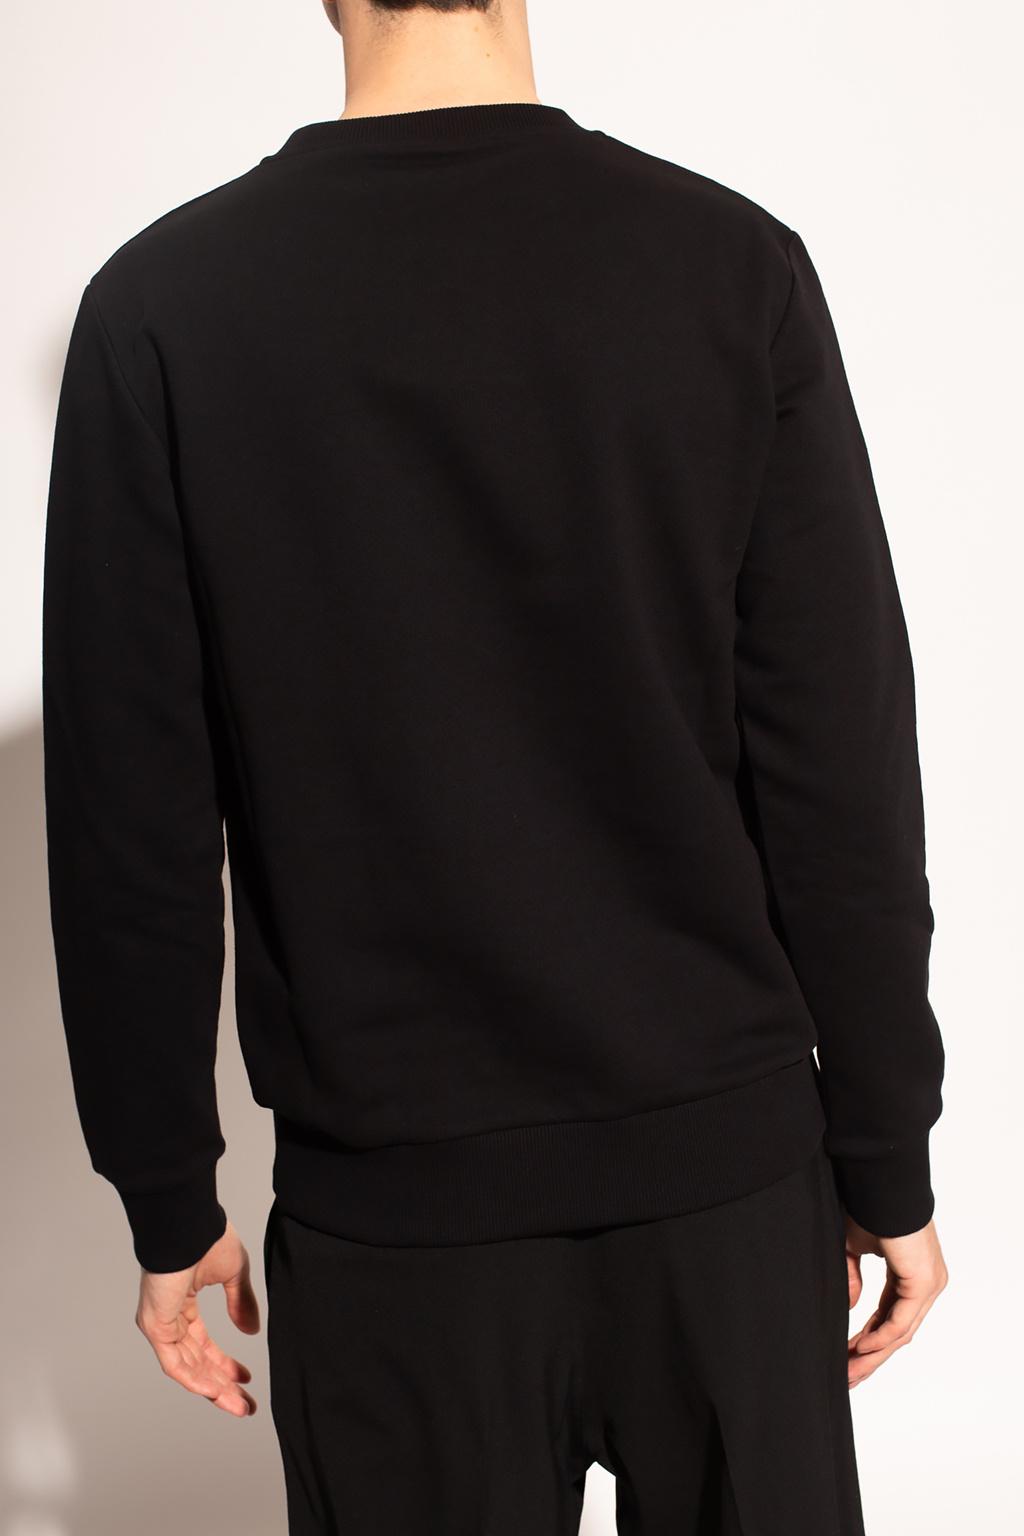 Balmain Sweatshirt with logo